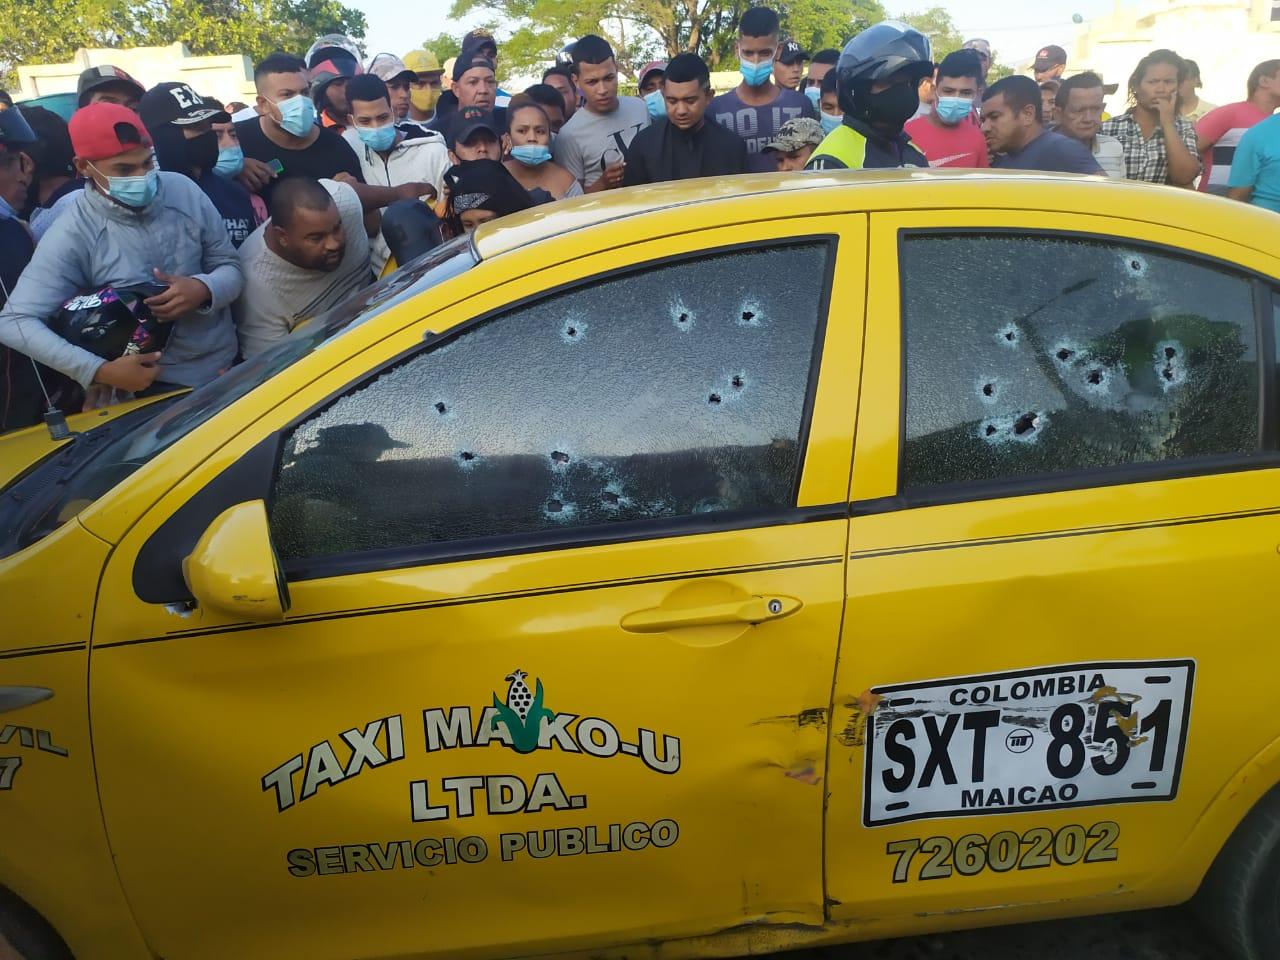 hoyennoticia.com, Tres muertos deja ataque sicarial en Maicao